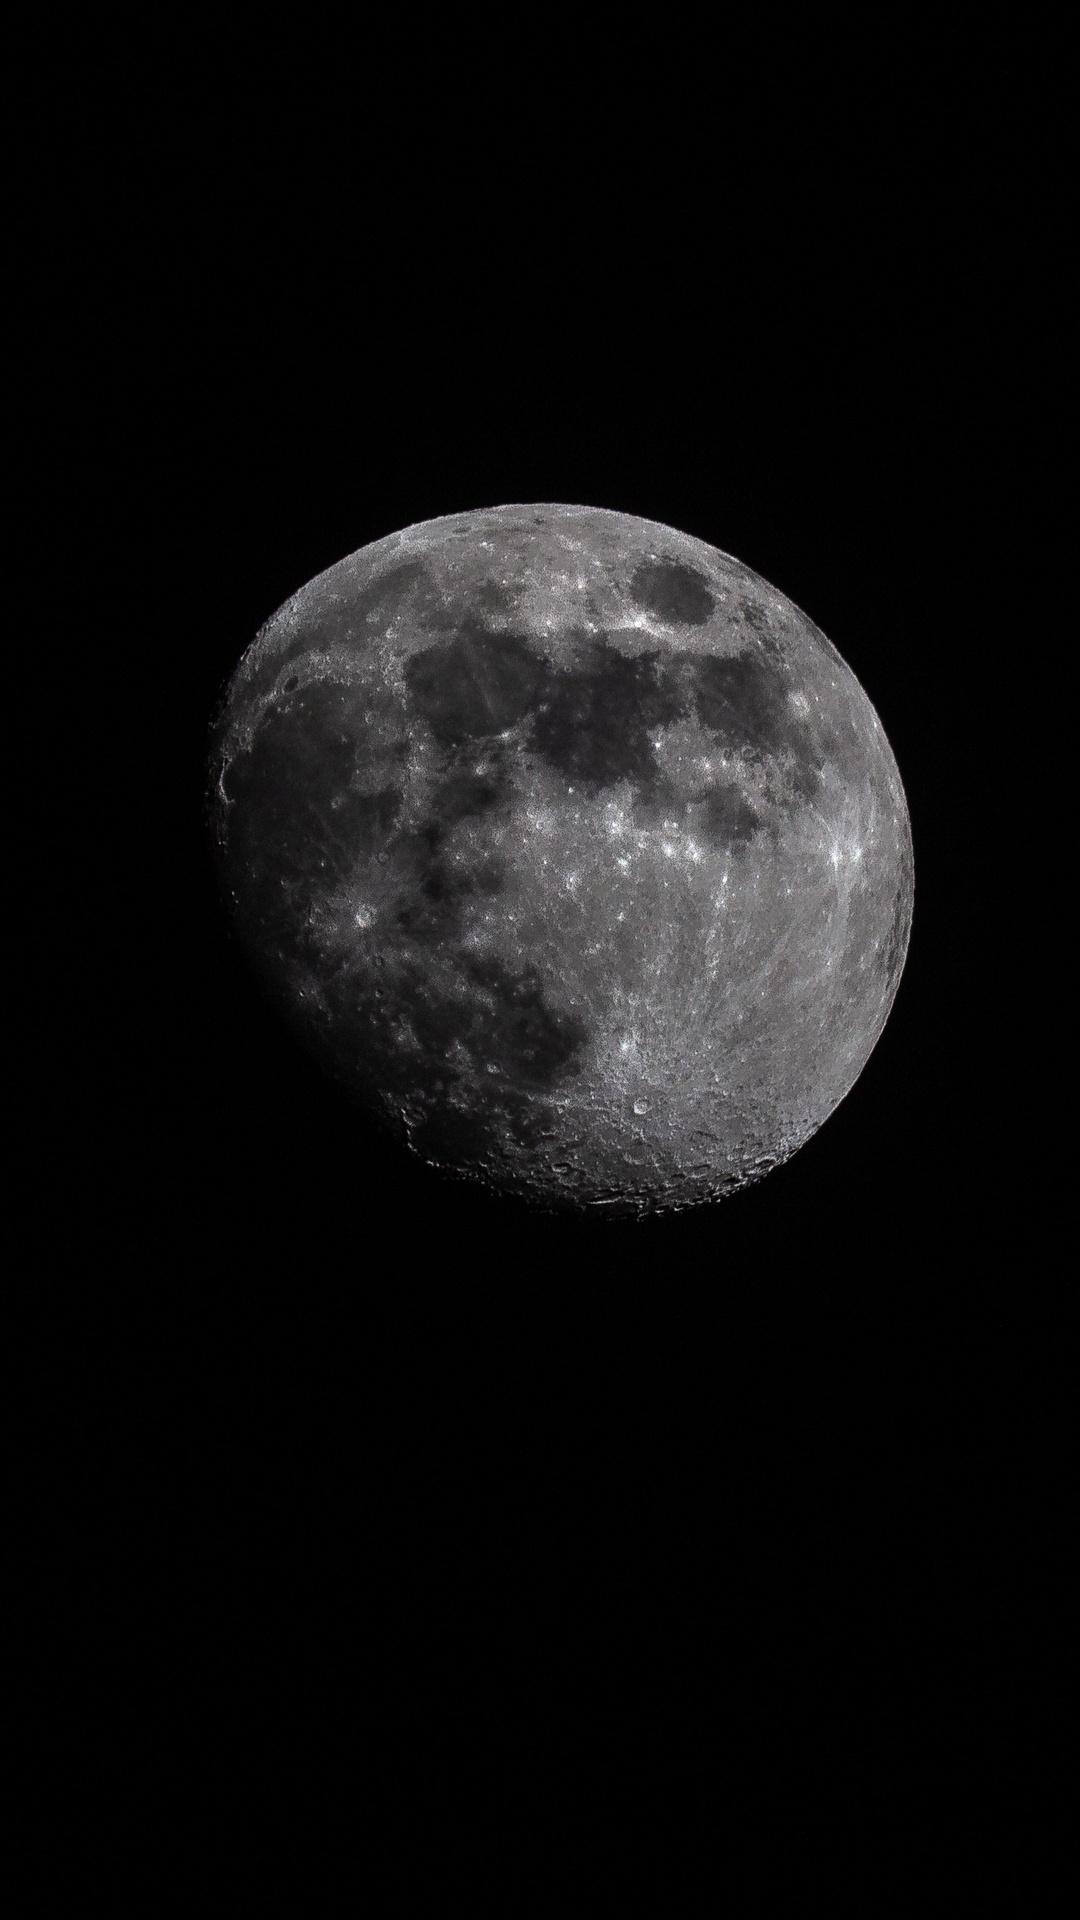 1080x1920 Moon Astrophotography Iphone 7 6s 6 Plus Pixel xl e